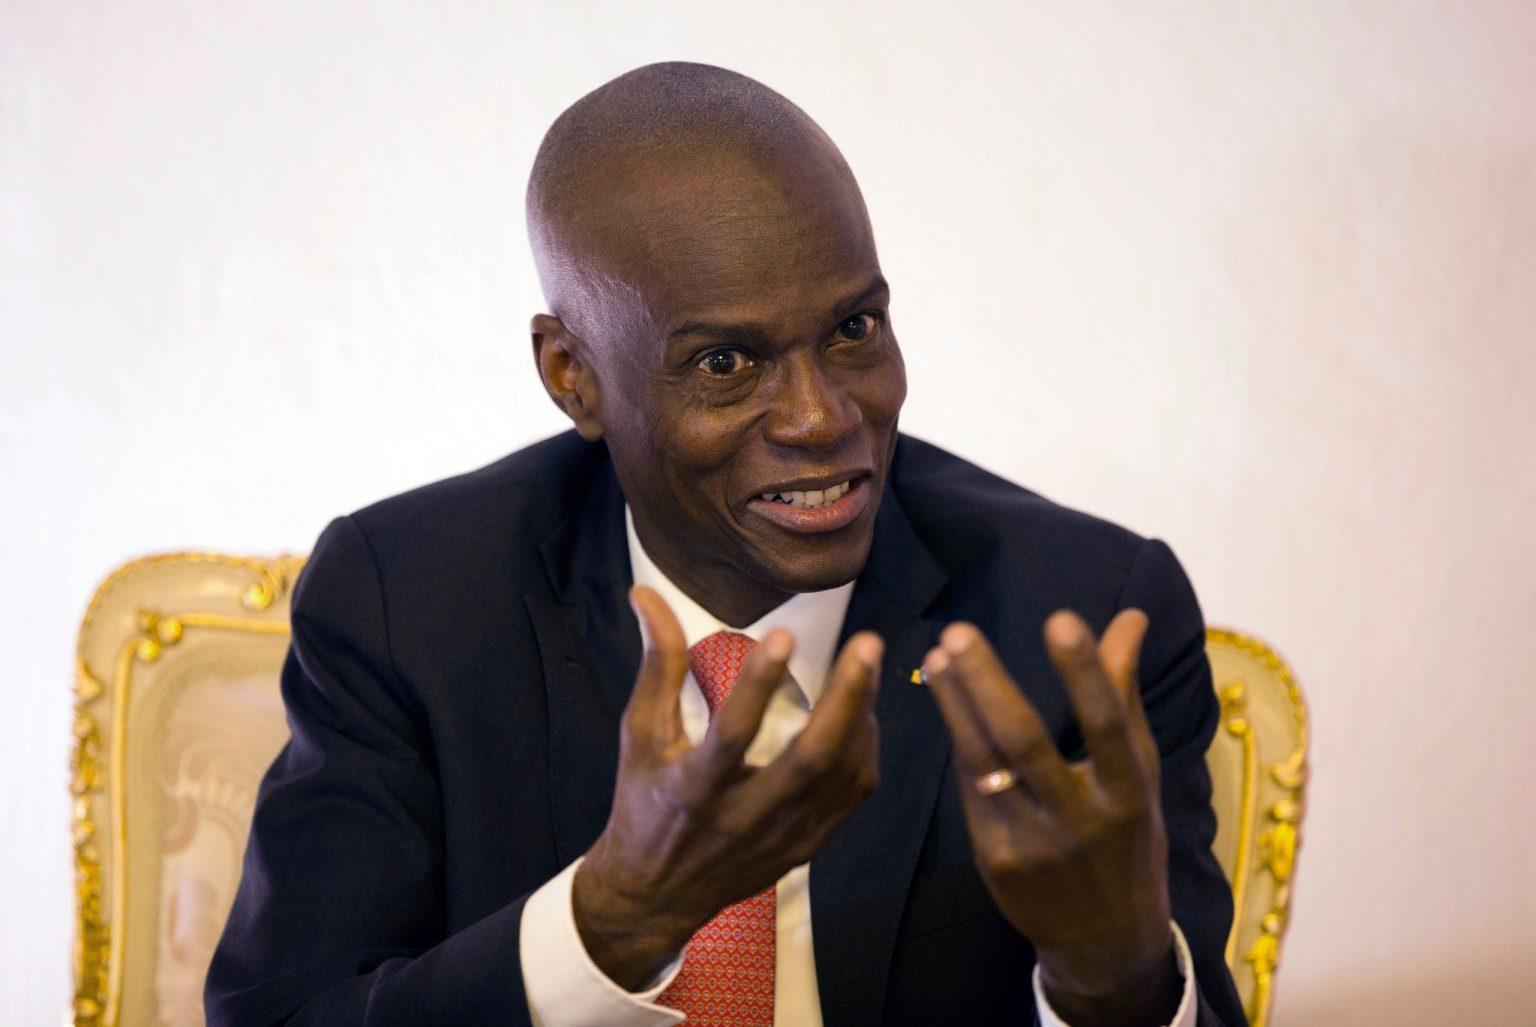 Haiti President Jovenel Moise assassinated at his home| ഹെയ്തി പ്രസിഡന്റ് ജോവനൽ മൊയ്സ് വീട്ടിൽ വച്ച് കൊലചെയ്യപ്പെട്ടു_40.1